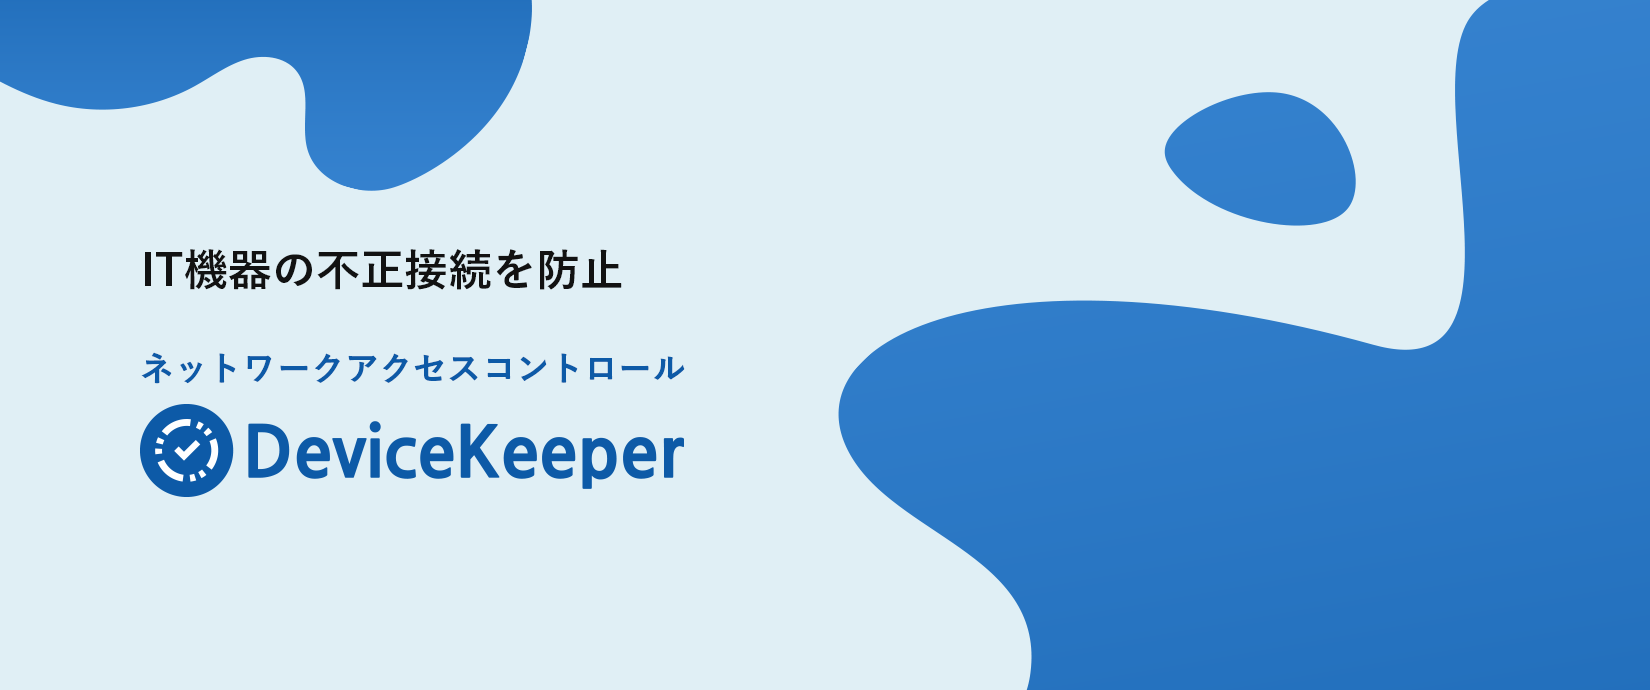 DeviceKeeper